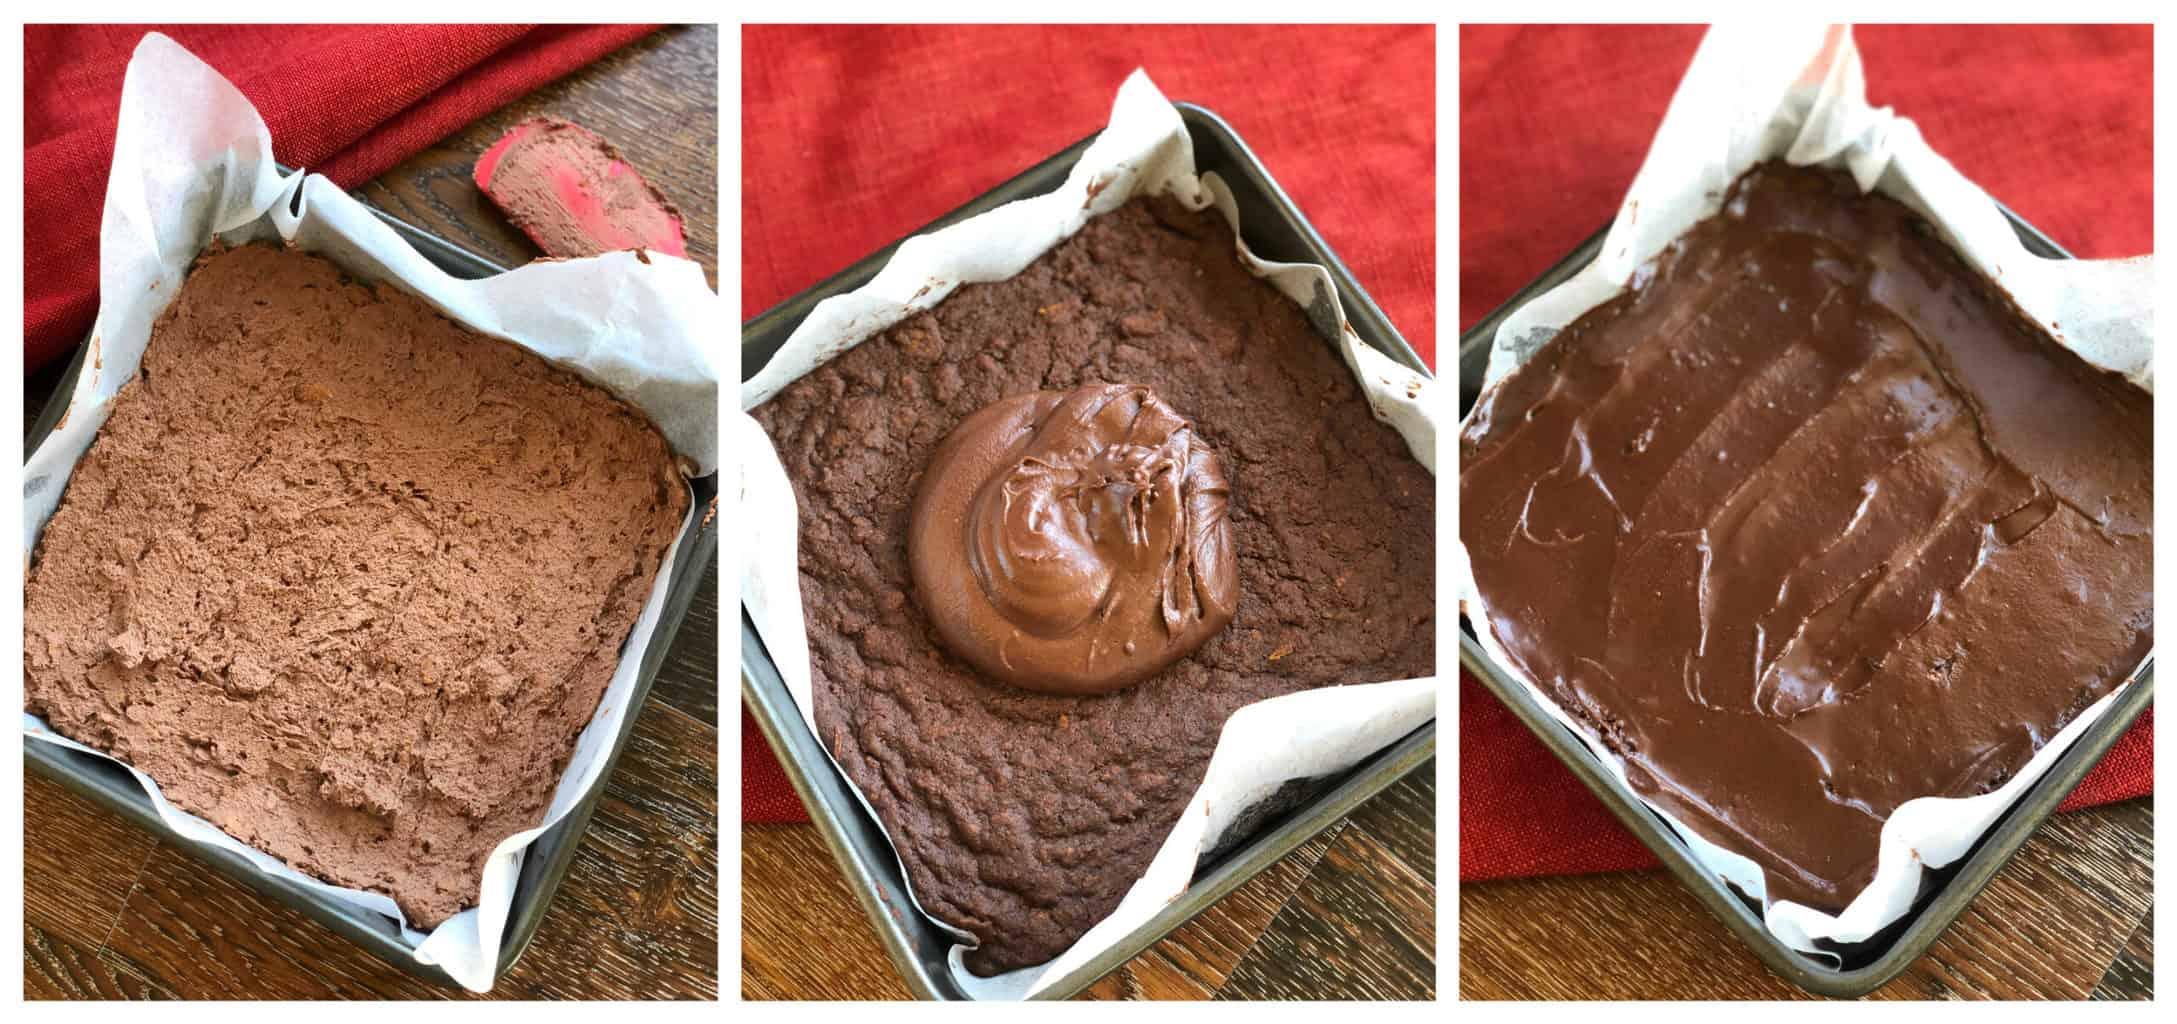 Chocolate Icing on Afghan Cornflake Slice